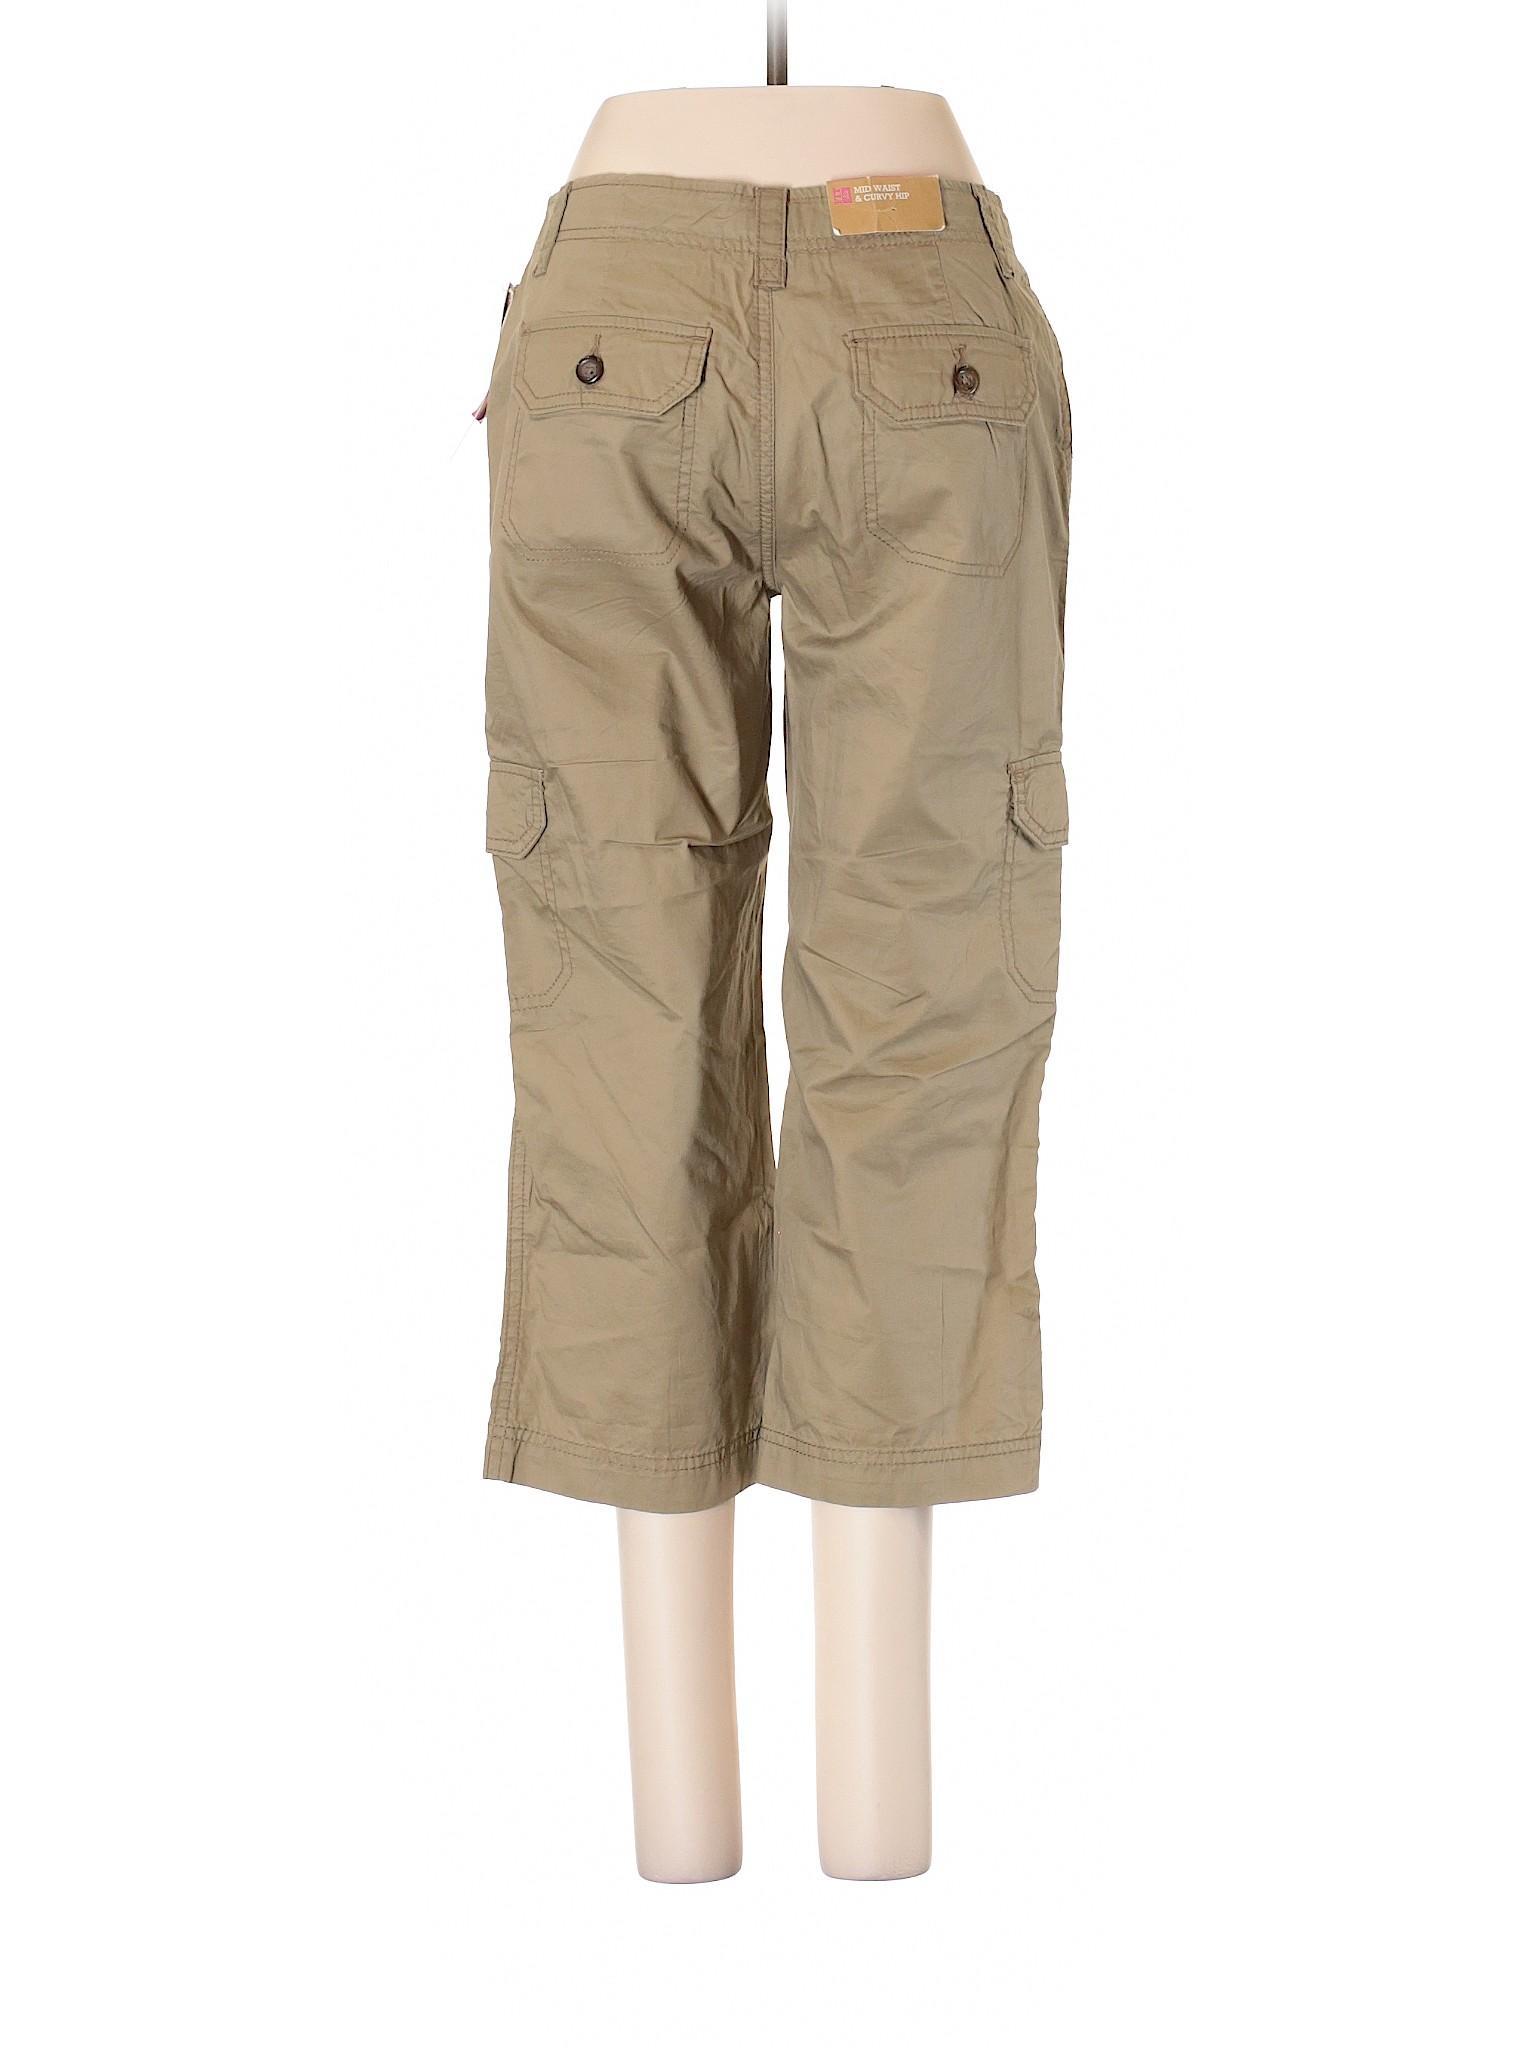 winter Boutique Cargo Merona Pants winter Merona Cargo Boutique Pants Boutique winter qBwC0nX